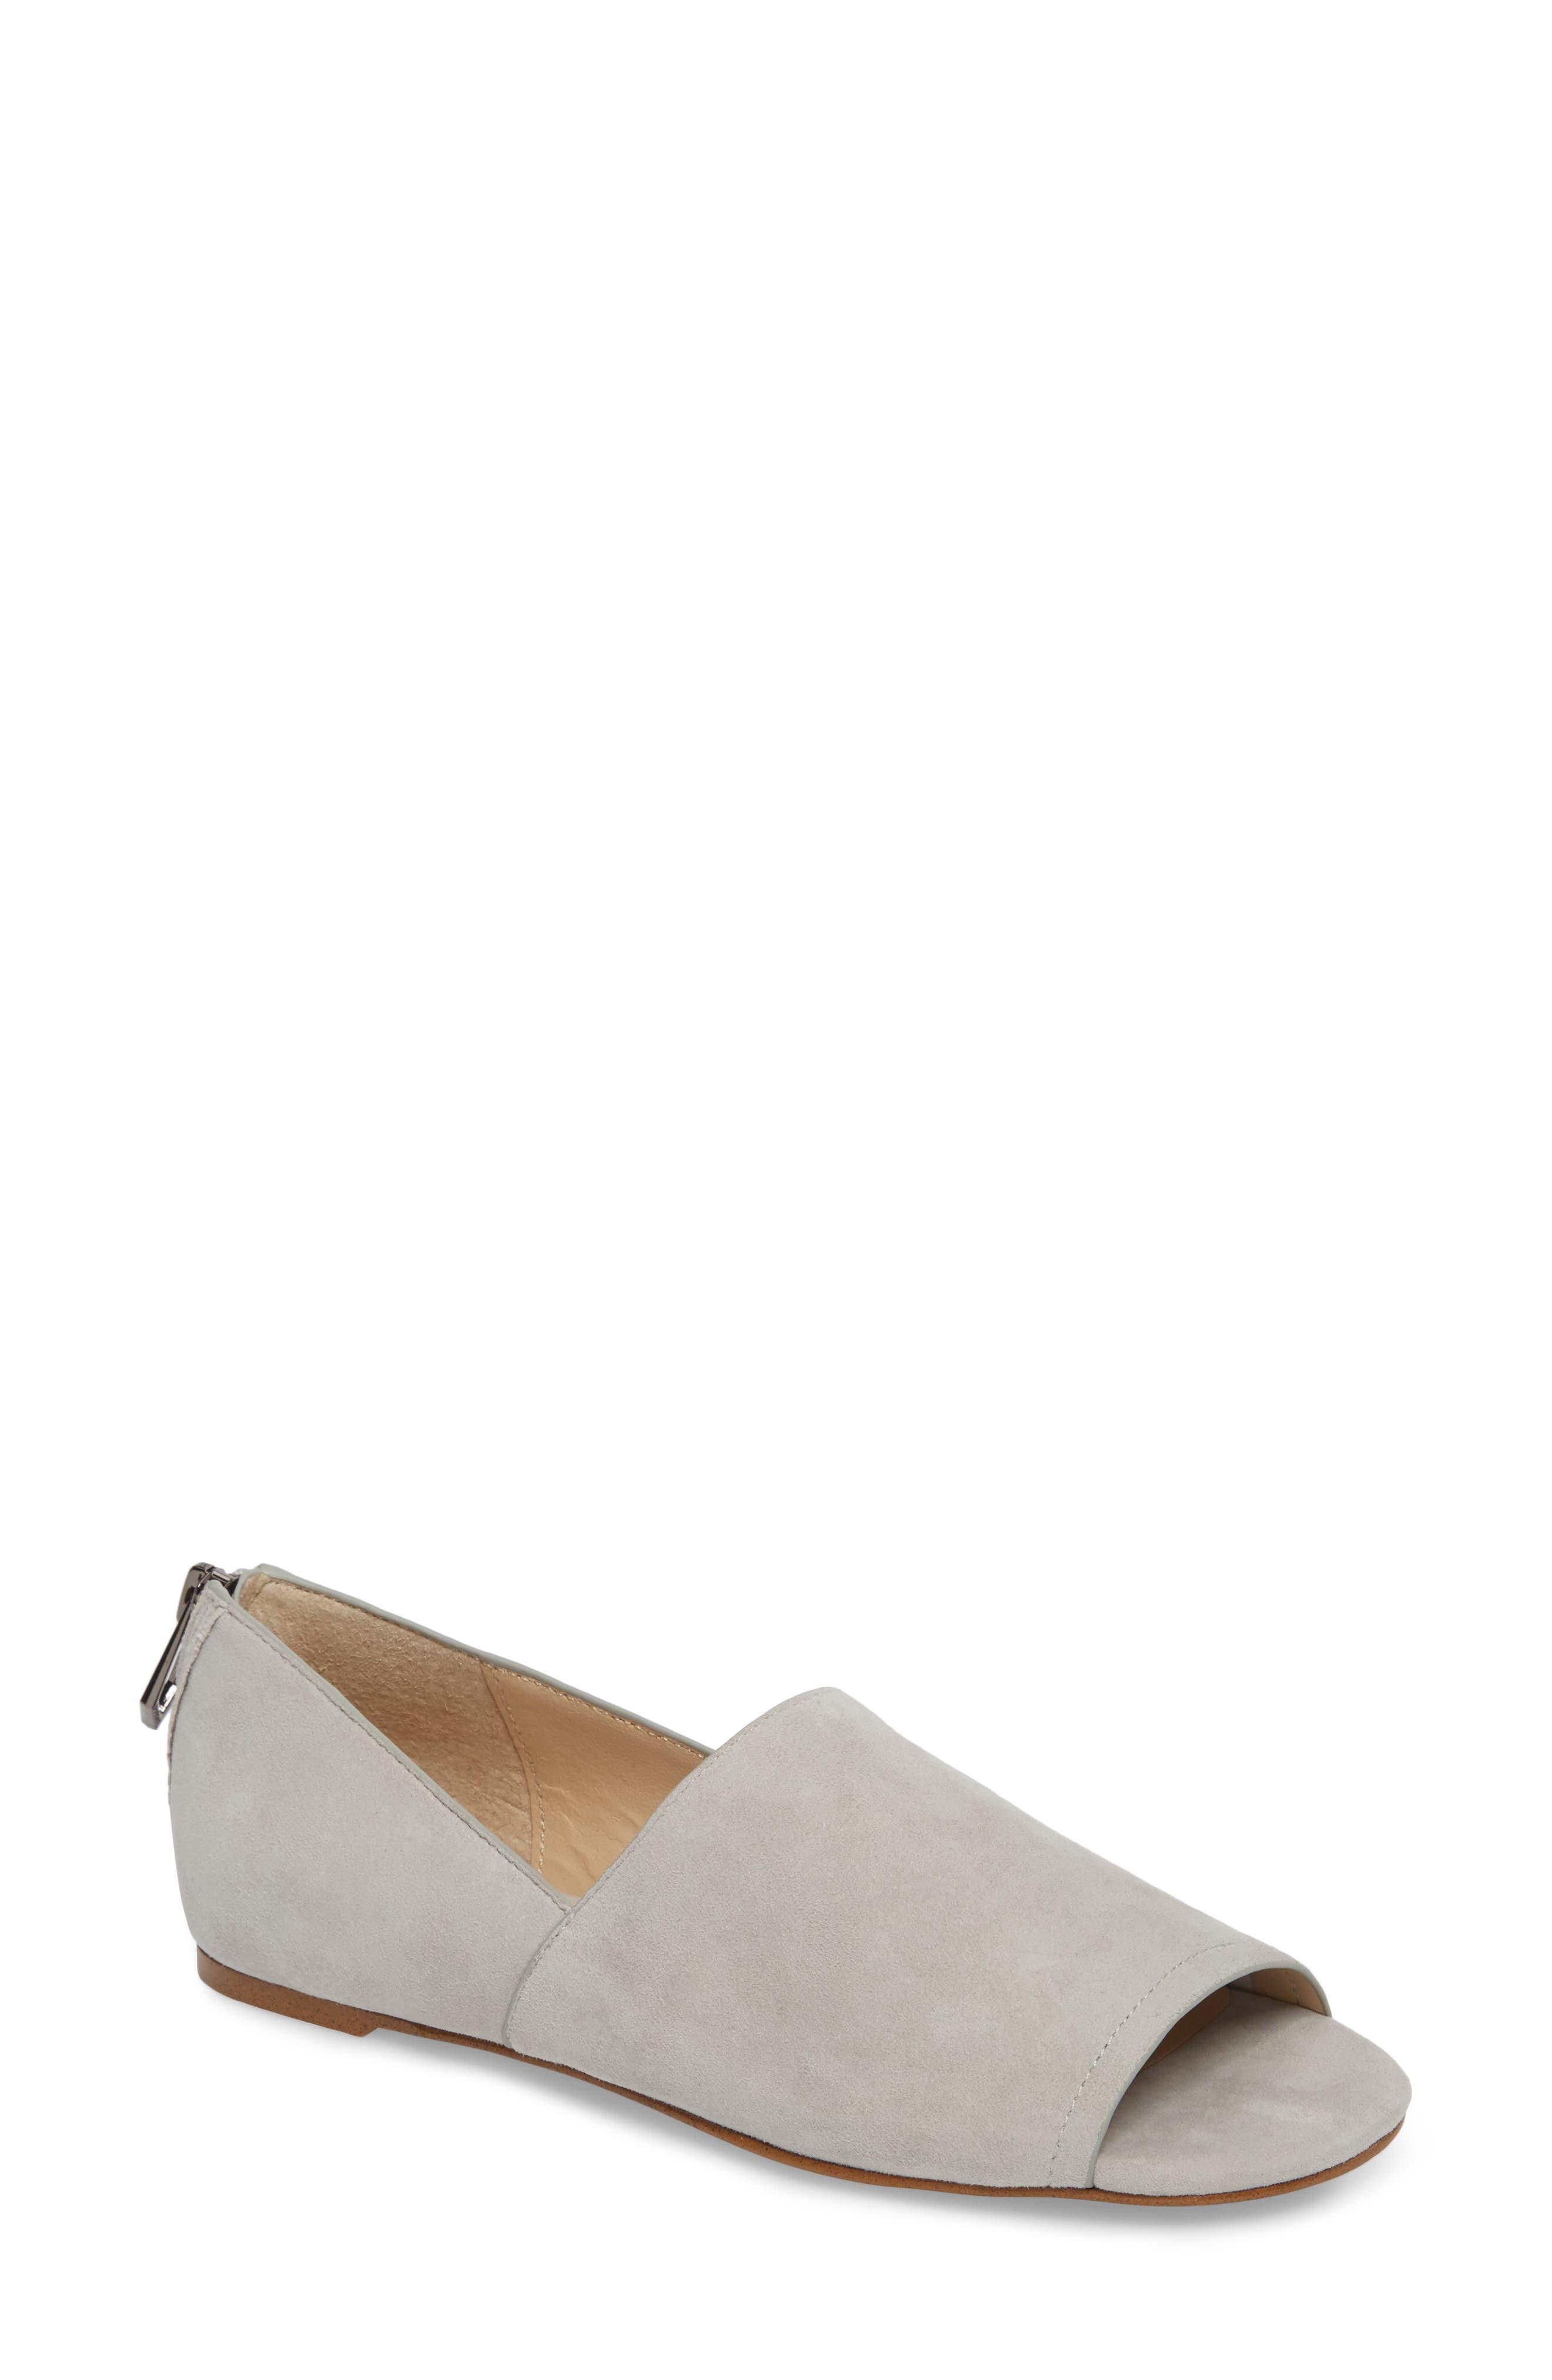 Maxine Peep Toe Flat,                         Main,                         color, Clay Suede